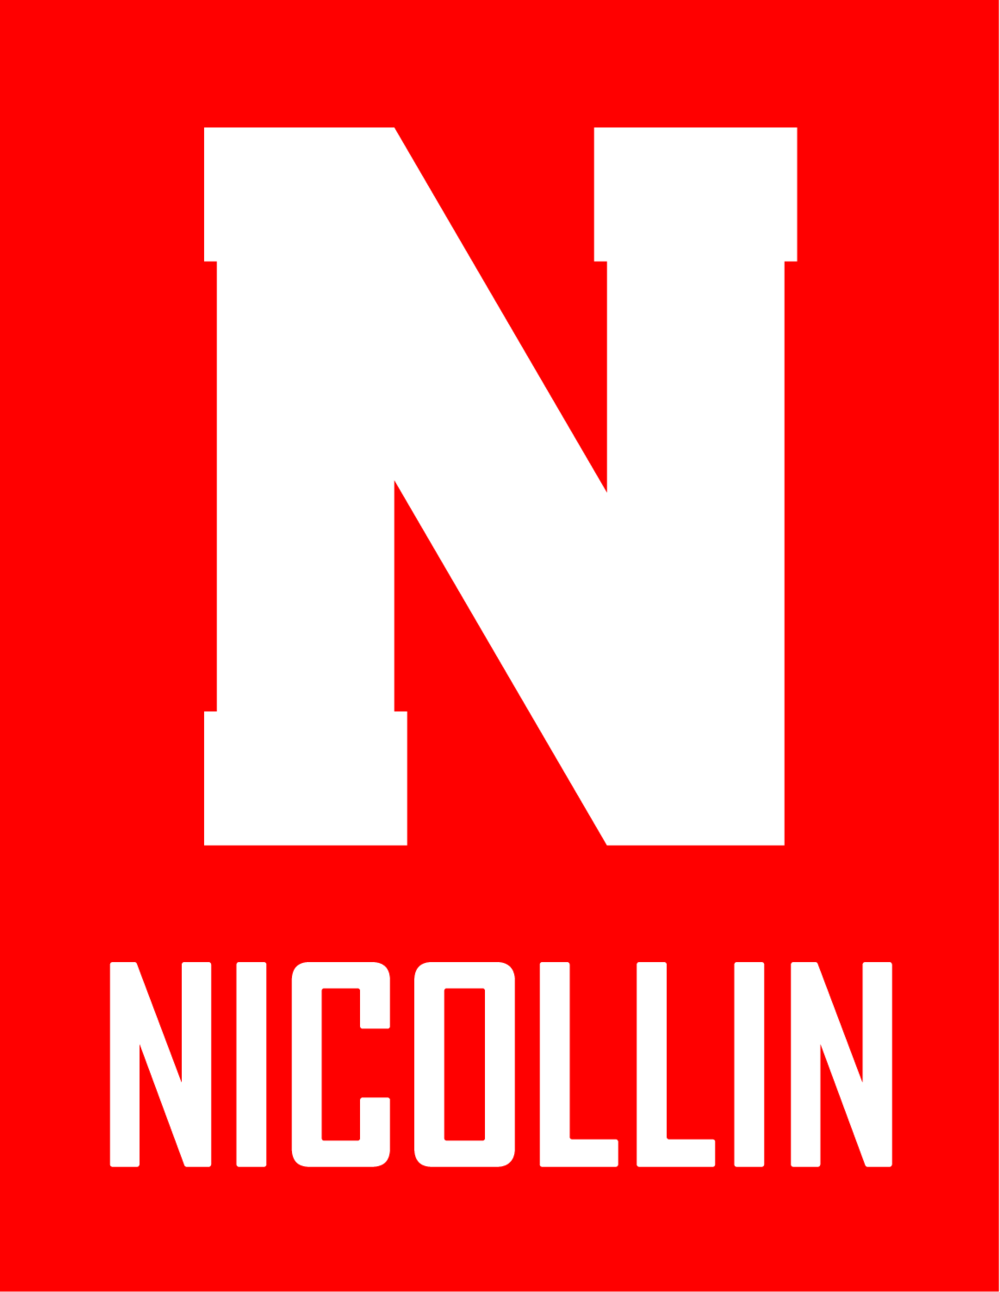 logo-nicollin.png